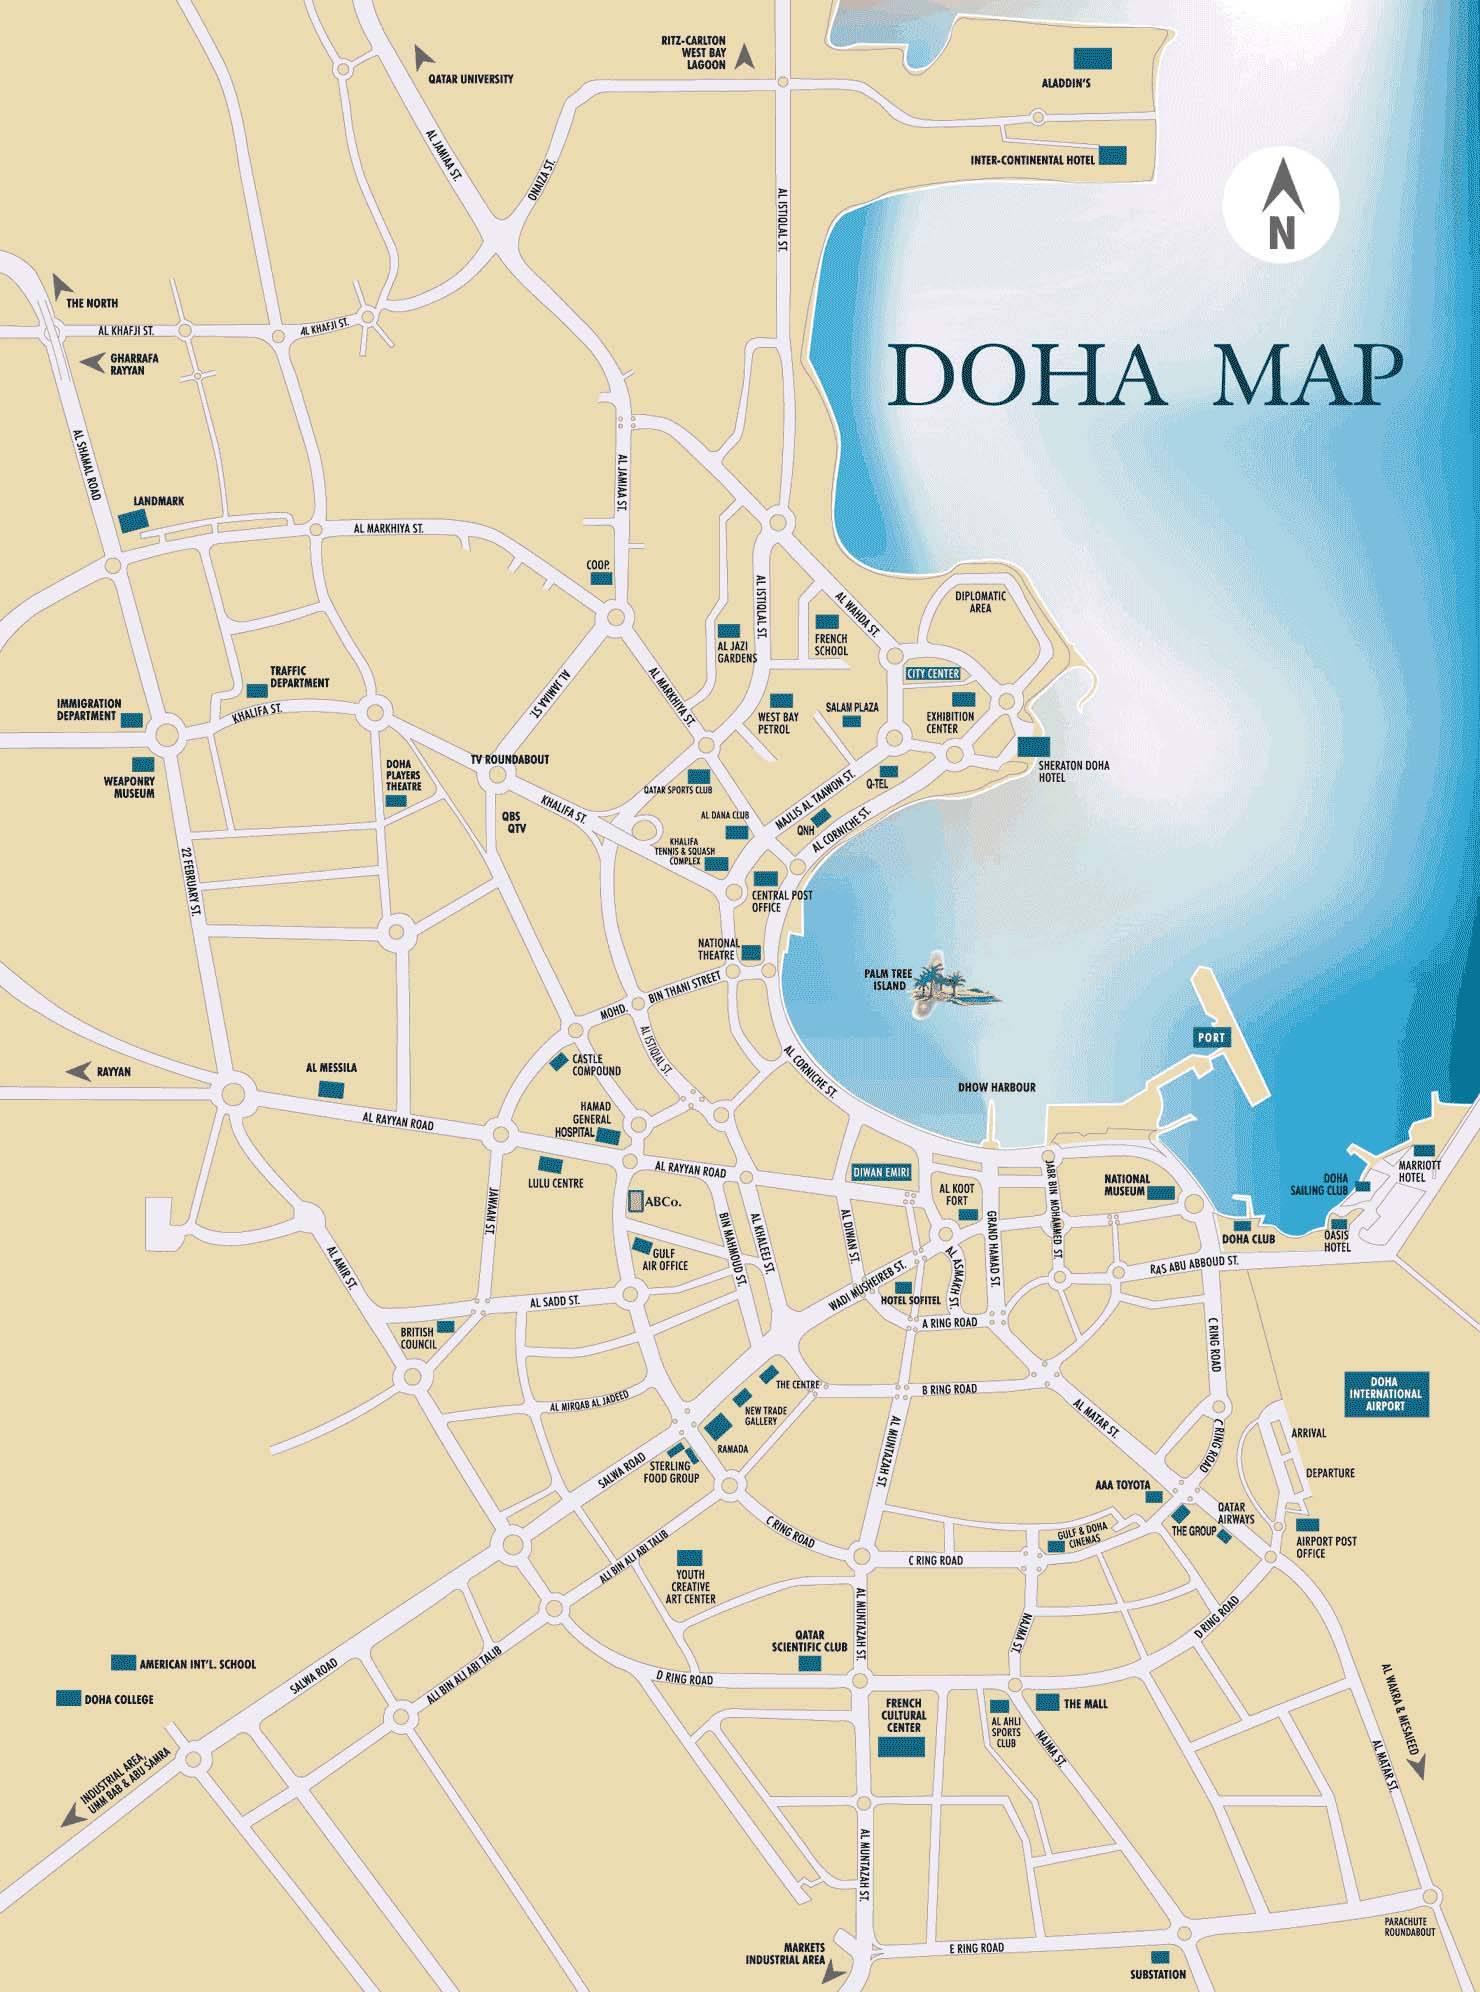 Doha Qatar Map Large Doha Maps for Free Download and Print | High Resolution and